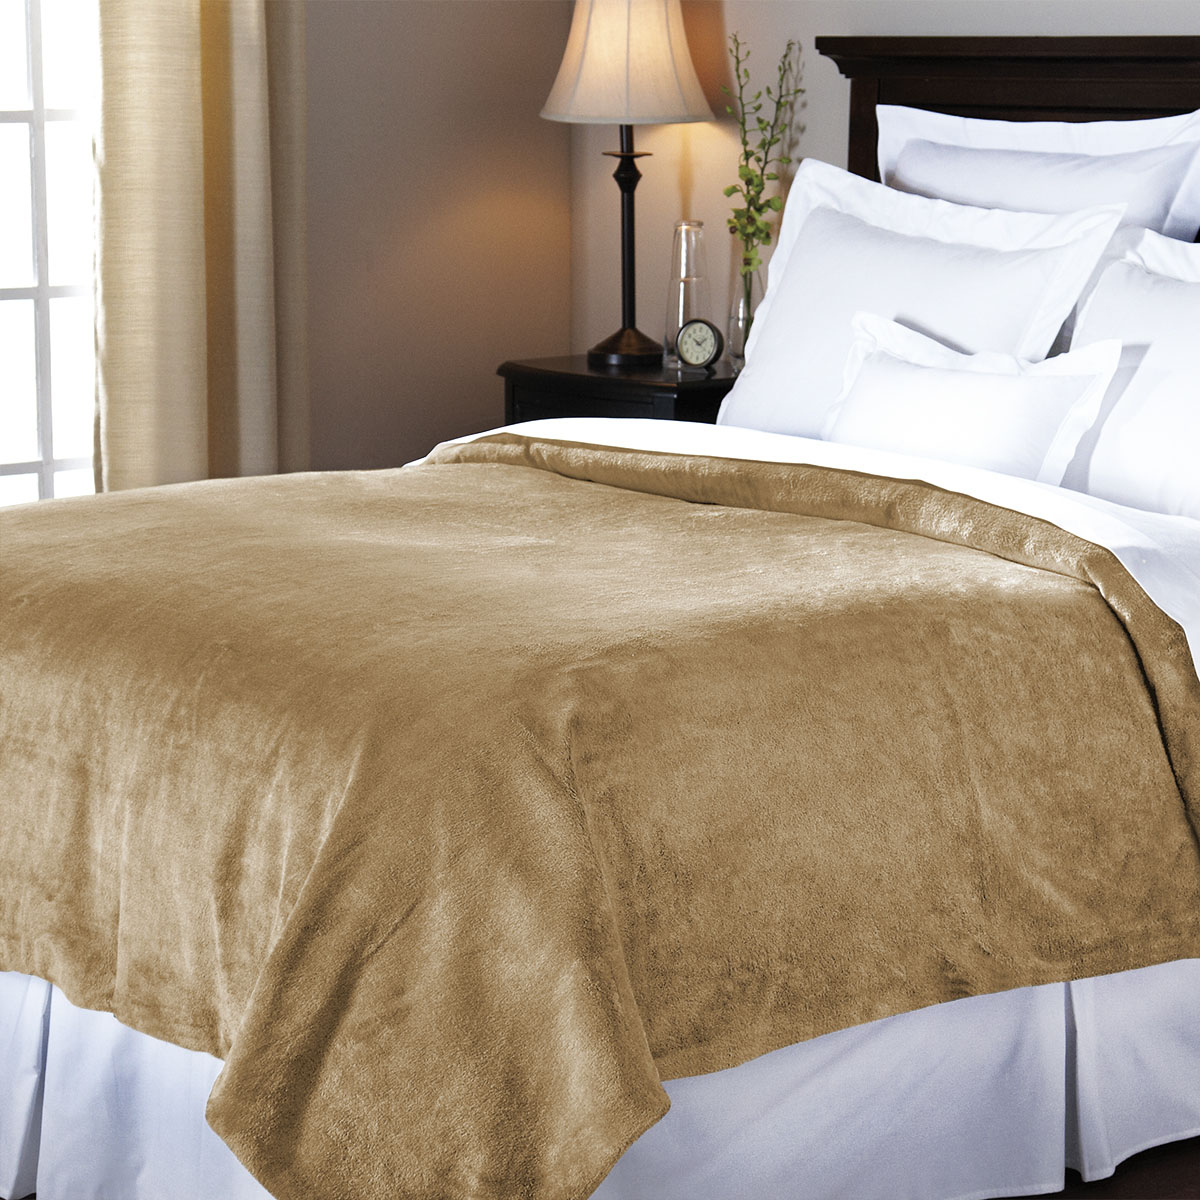 couverture chauffante sunbeam royal mink 1 place miel sunbeam canada. Black Bedroom Furniture Sets. Home Design Ideas